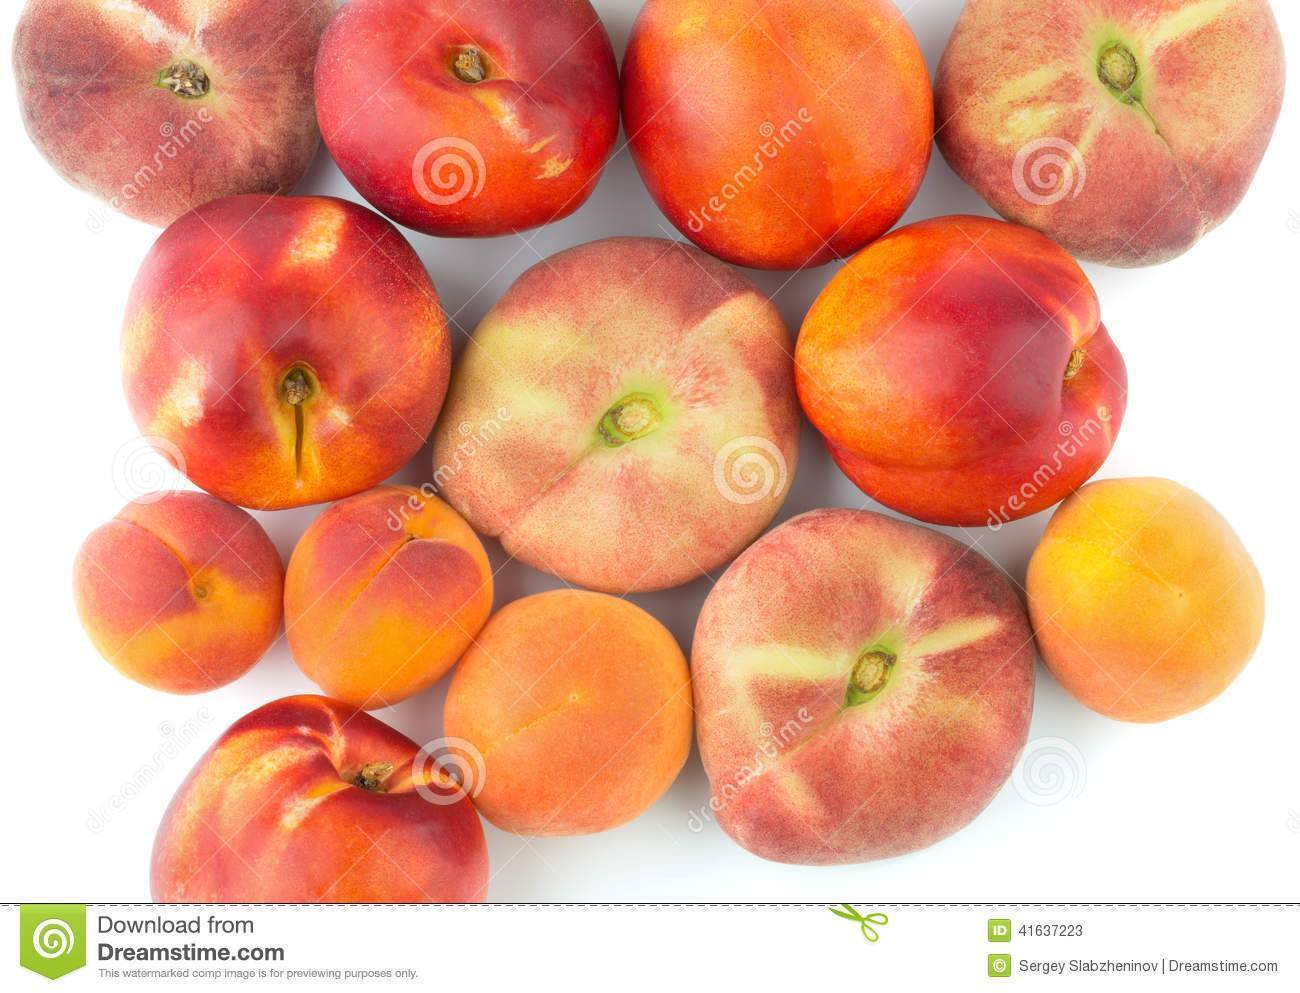 Гибрид сливы, абрикоса и персика шарафуга, фото - общая информация - 2020